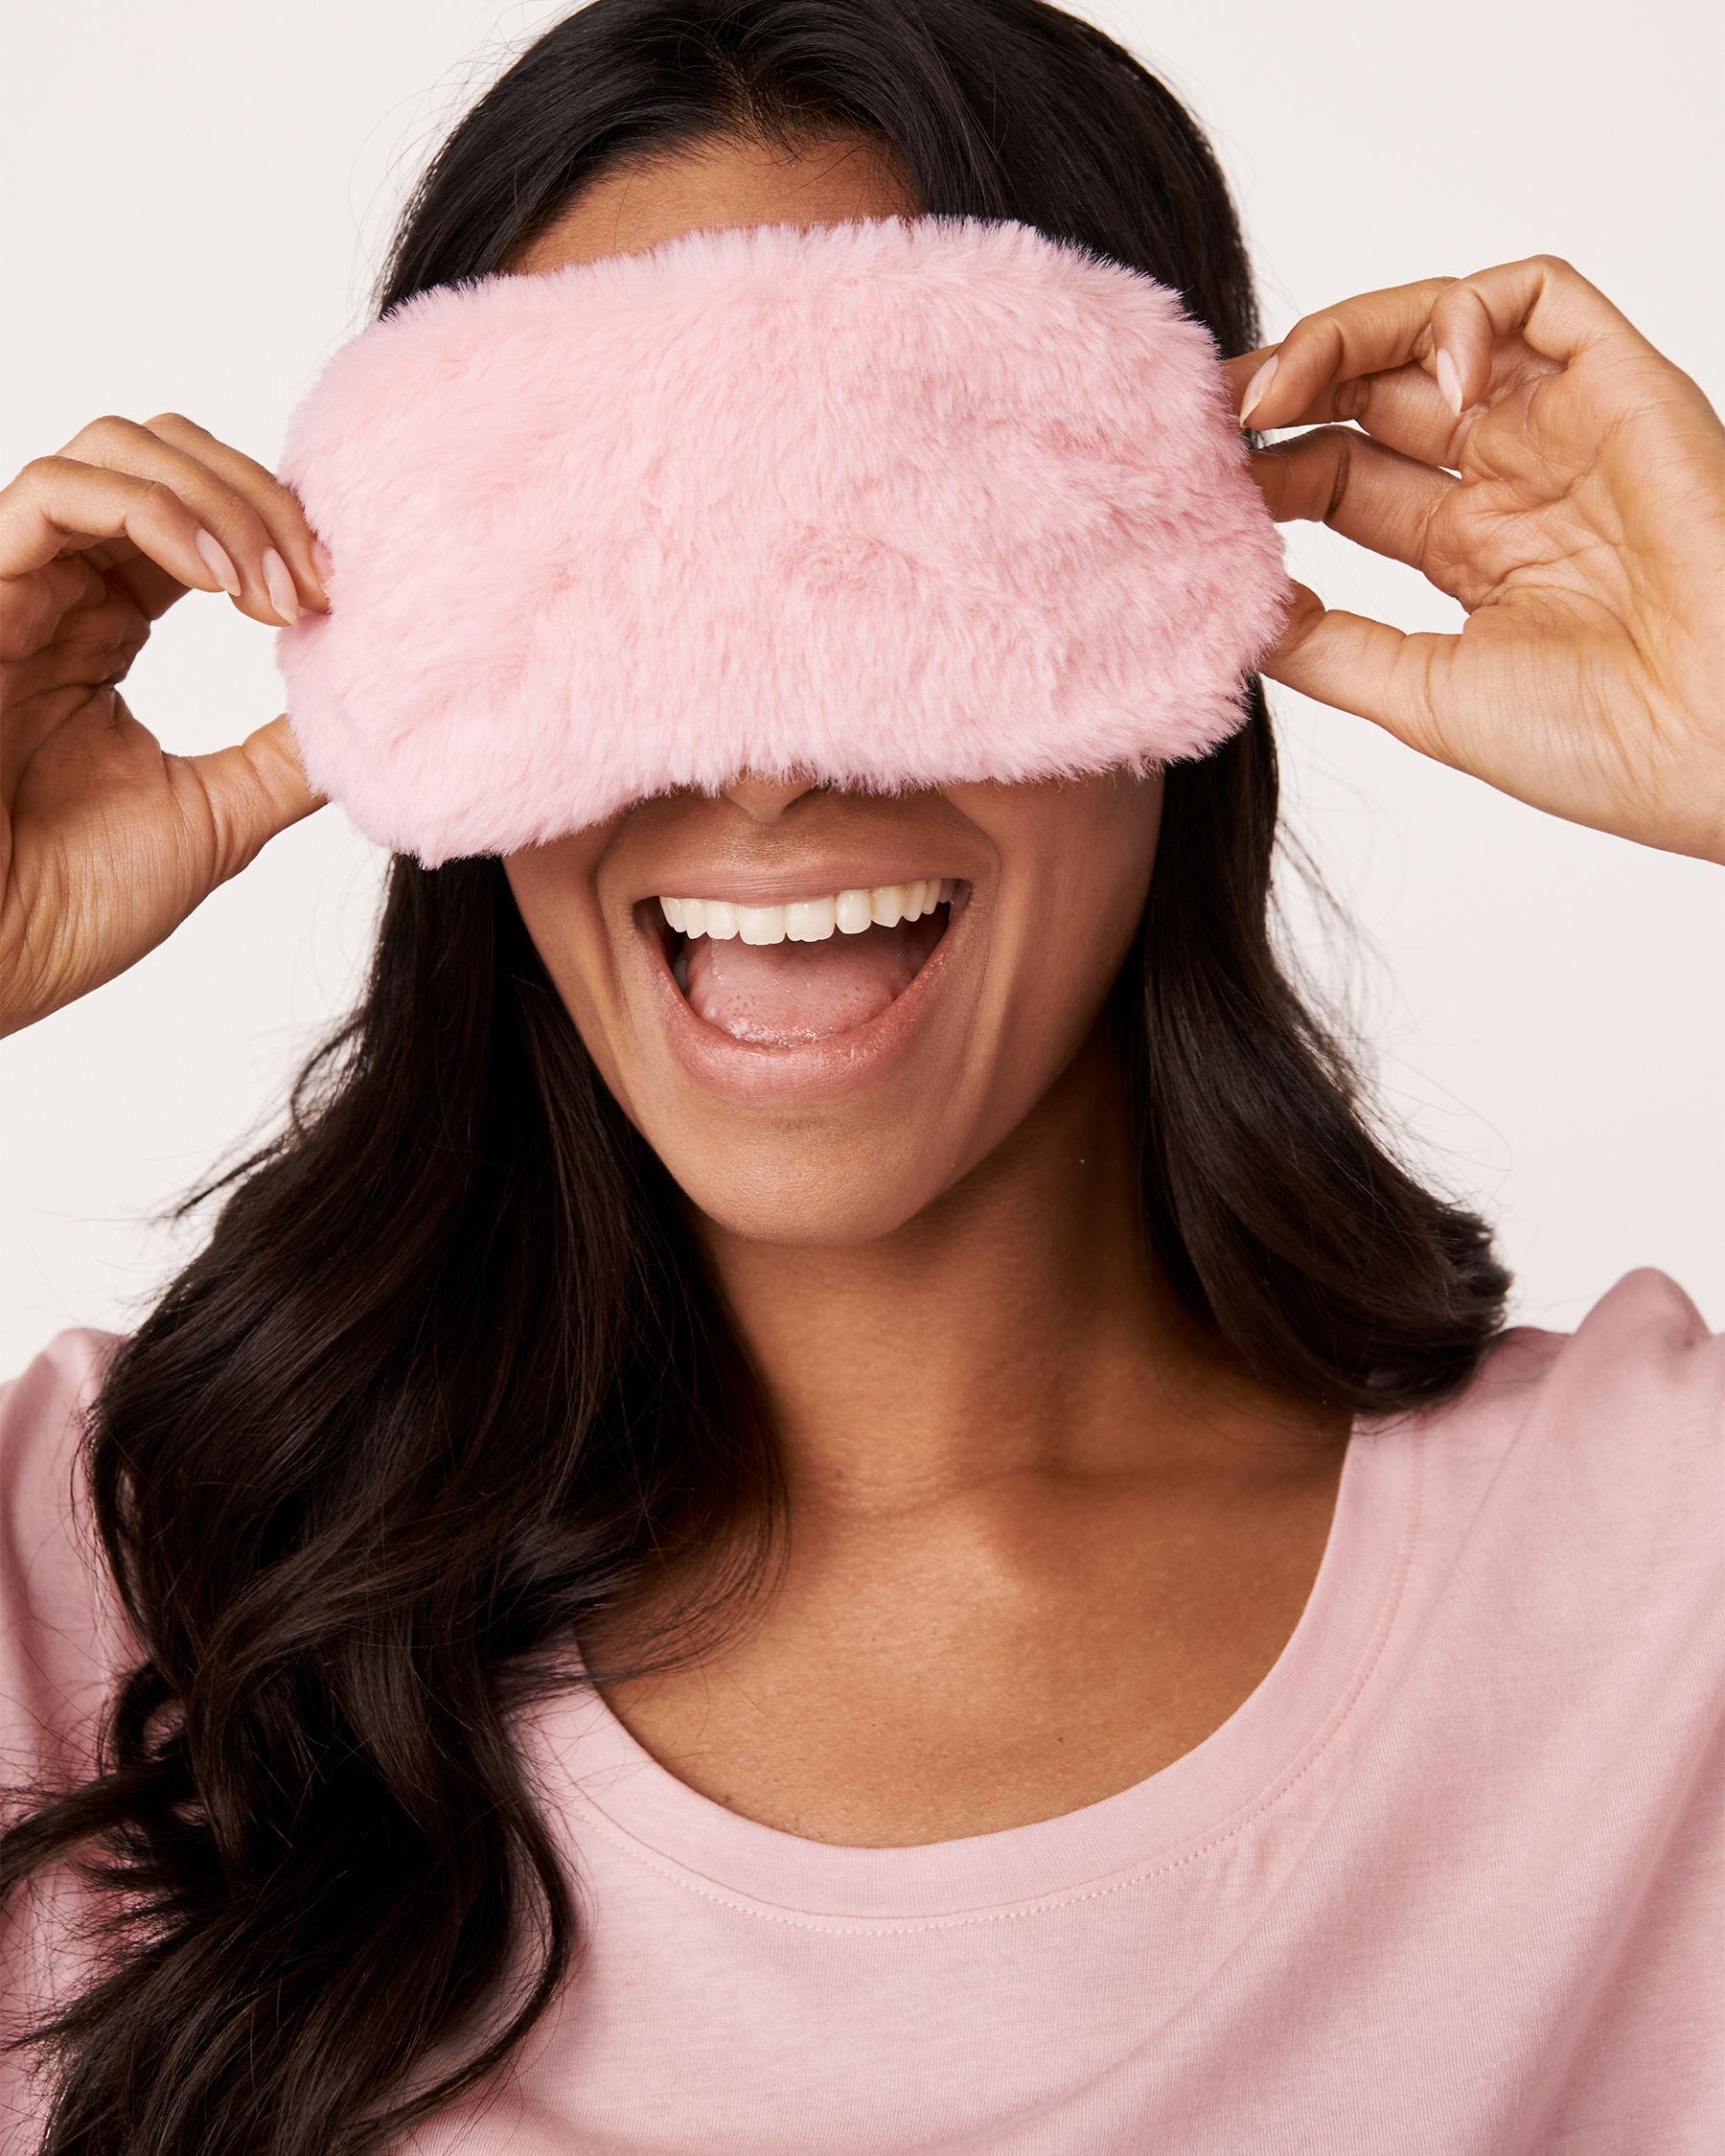 LA VIE EN ROSE Warm and Cool Eyemask Pale pink lilas 781-522-0-11 - View3